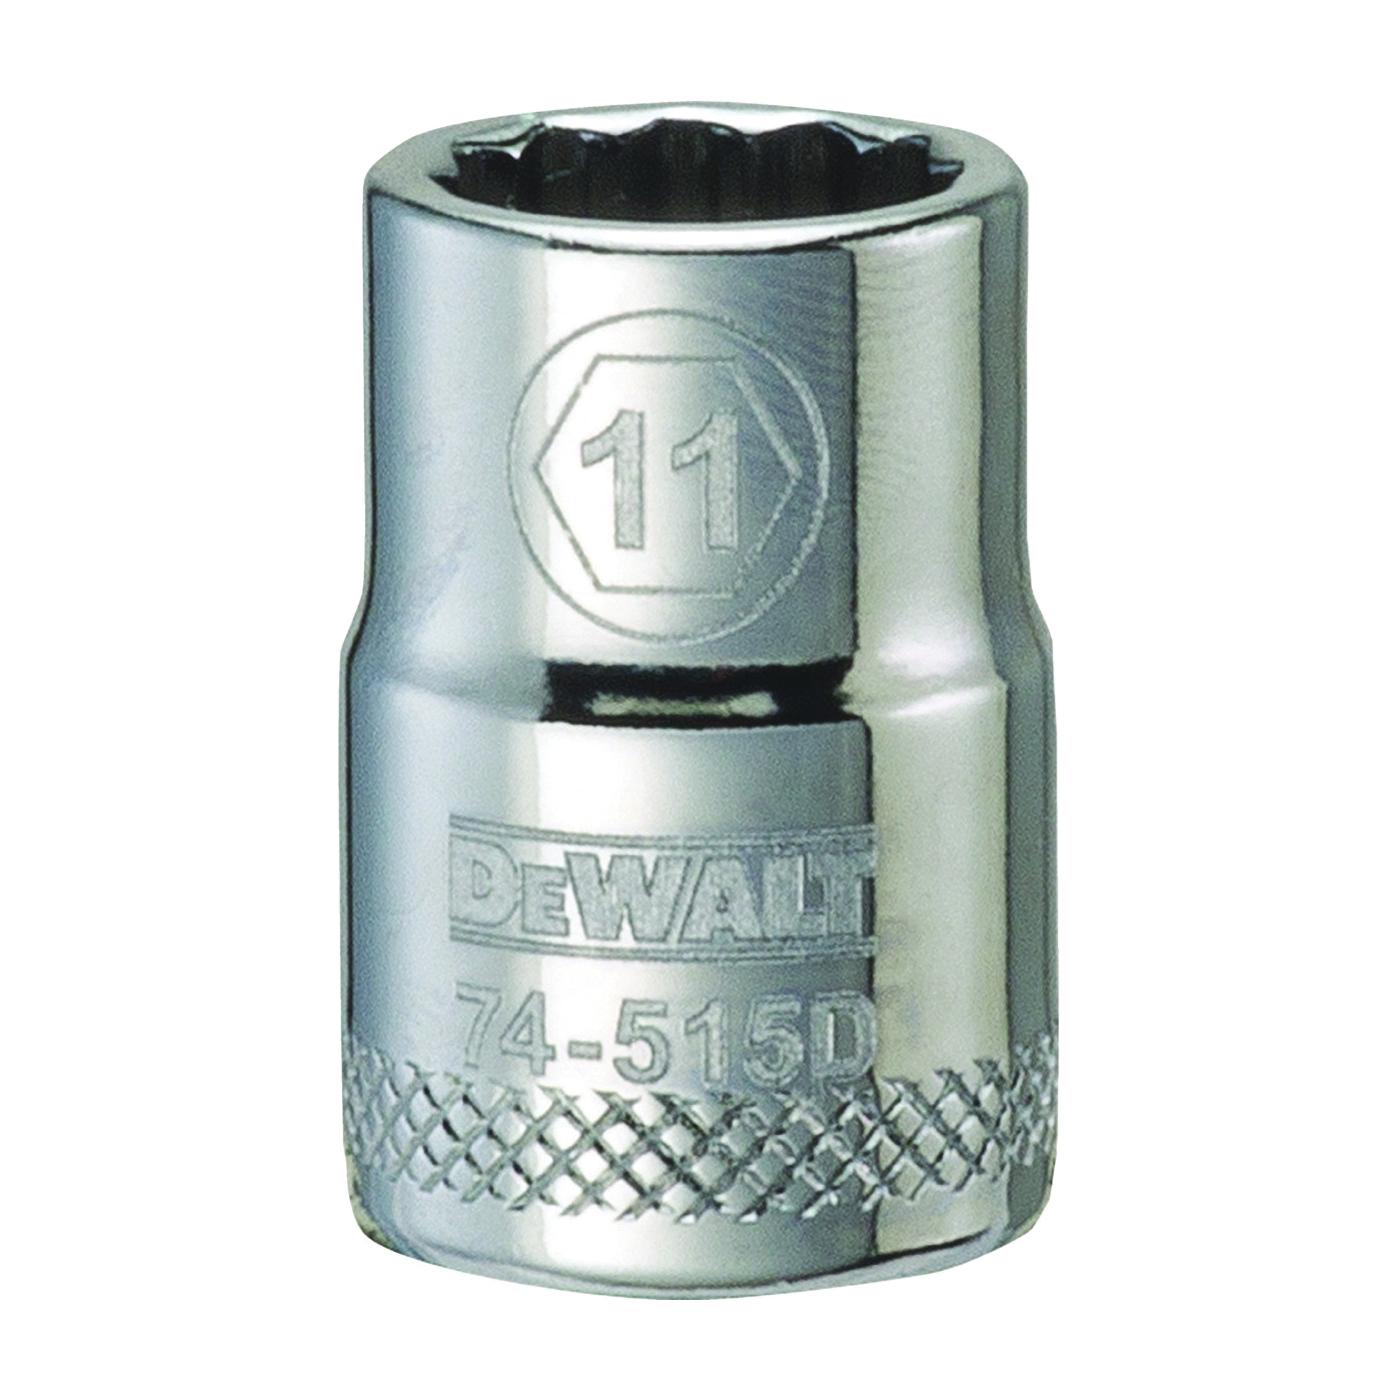 Picture of DeWALT DWMT74515OSP Hand Socket, 11 mm Socket, 3/8 in Drive, 12 -Point, Vanadium Steel, Polished Chrome